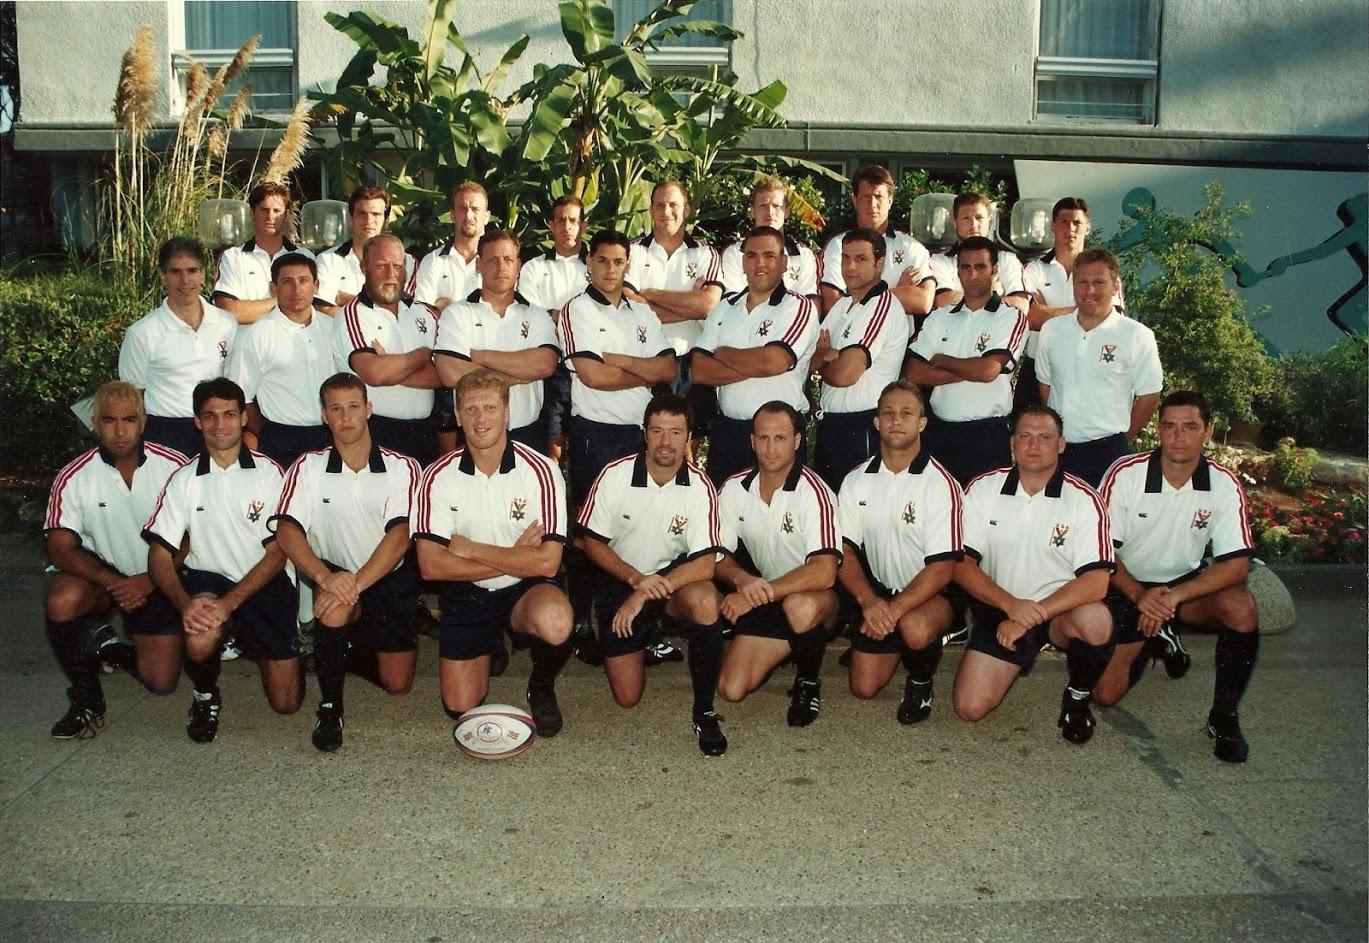 1997 Bill Taute - Maccabiah Gold Medal Team